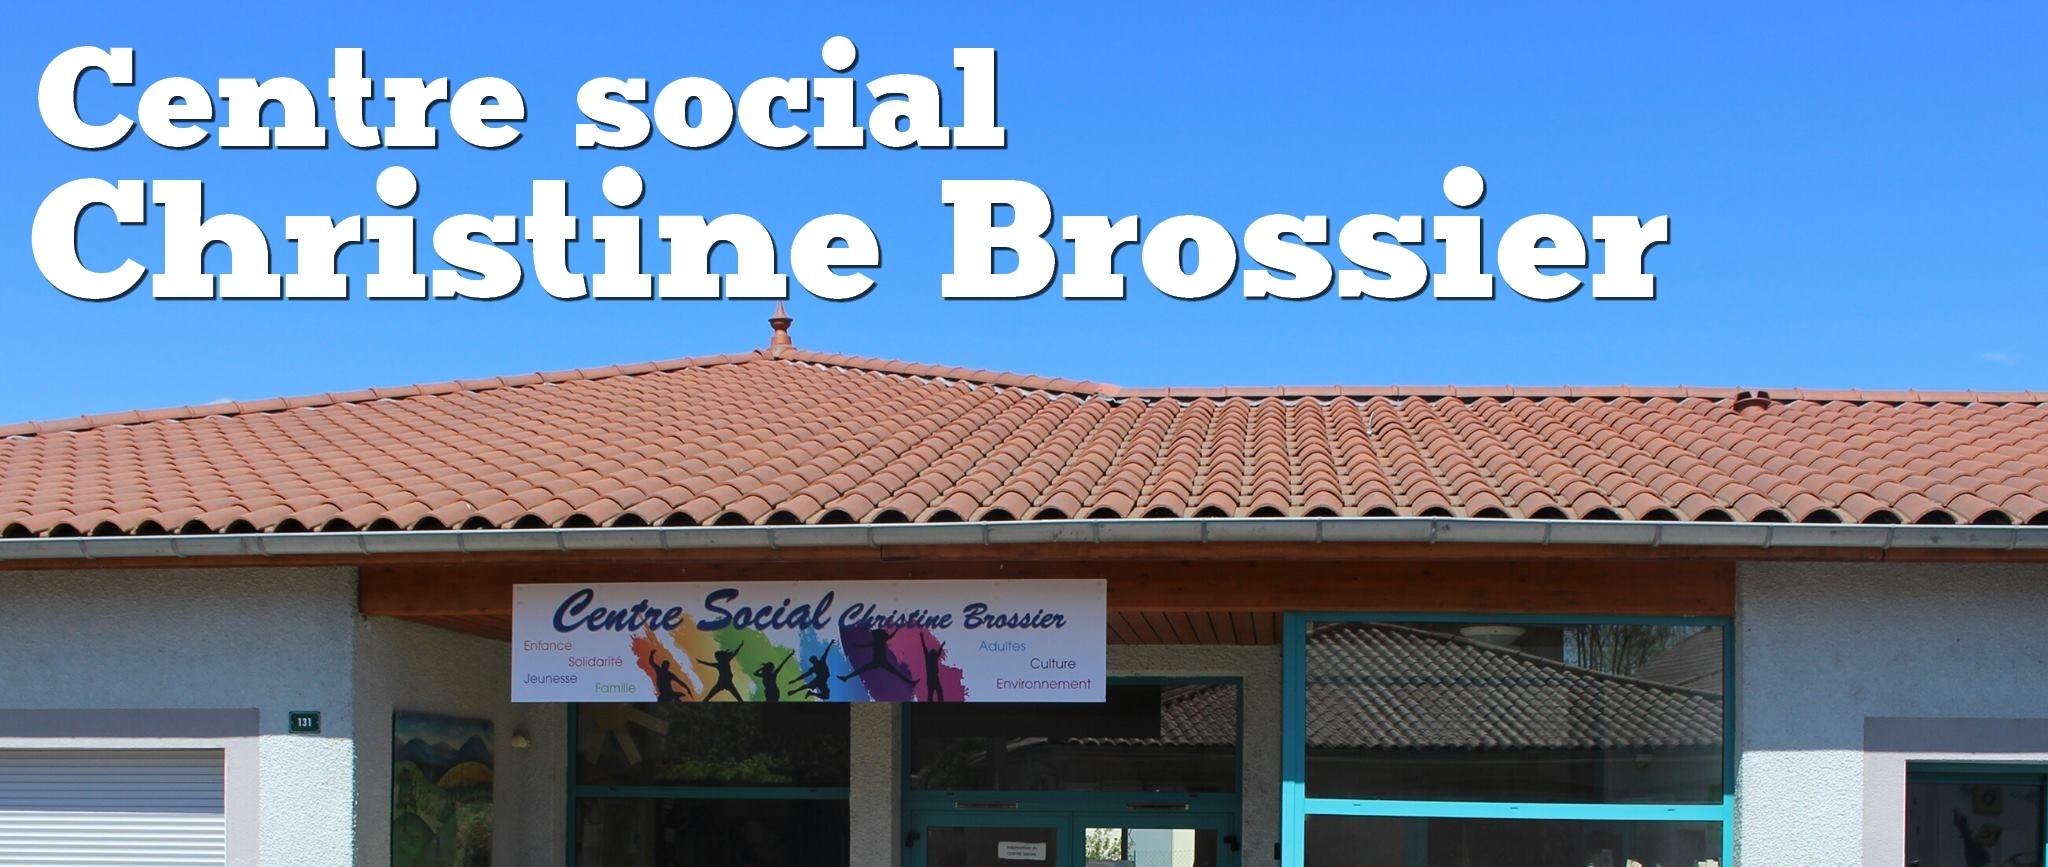 Centre social Christine Brossier